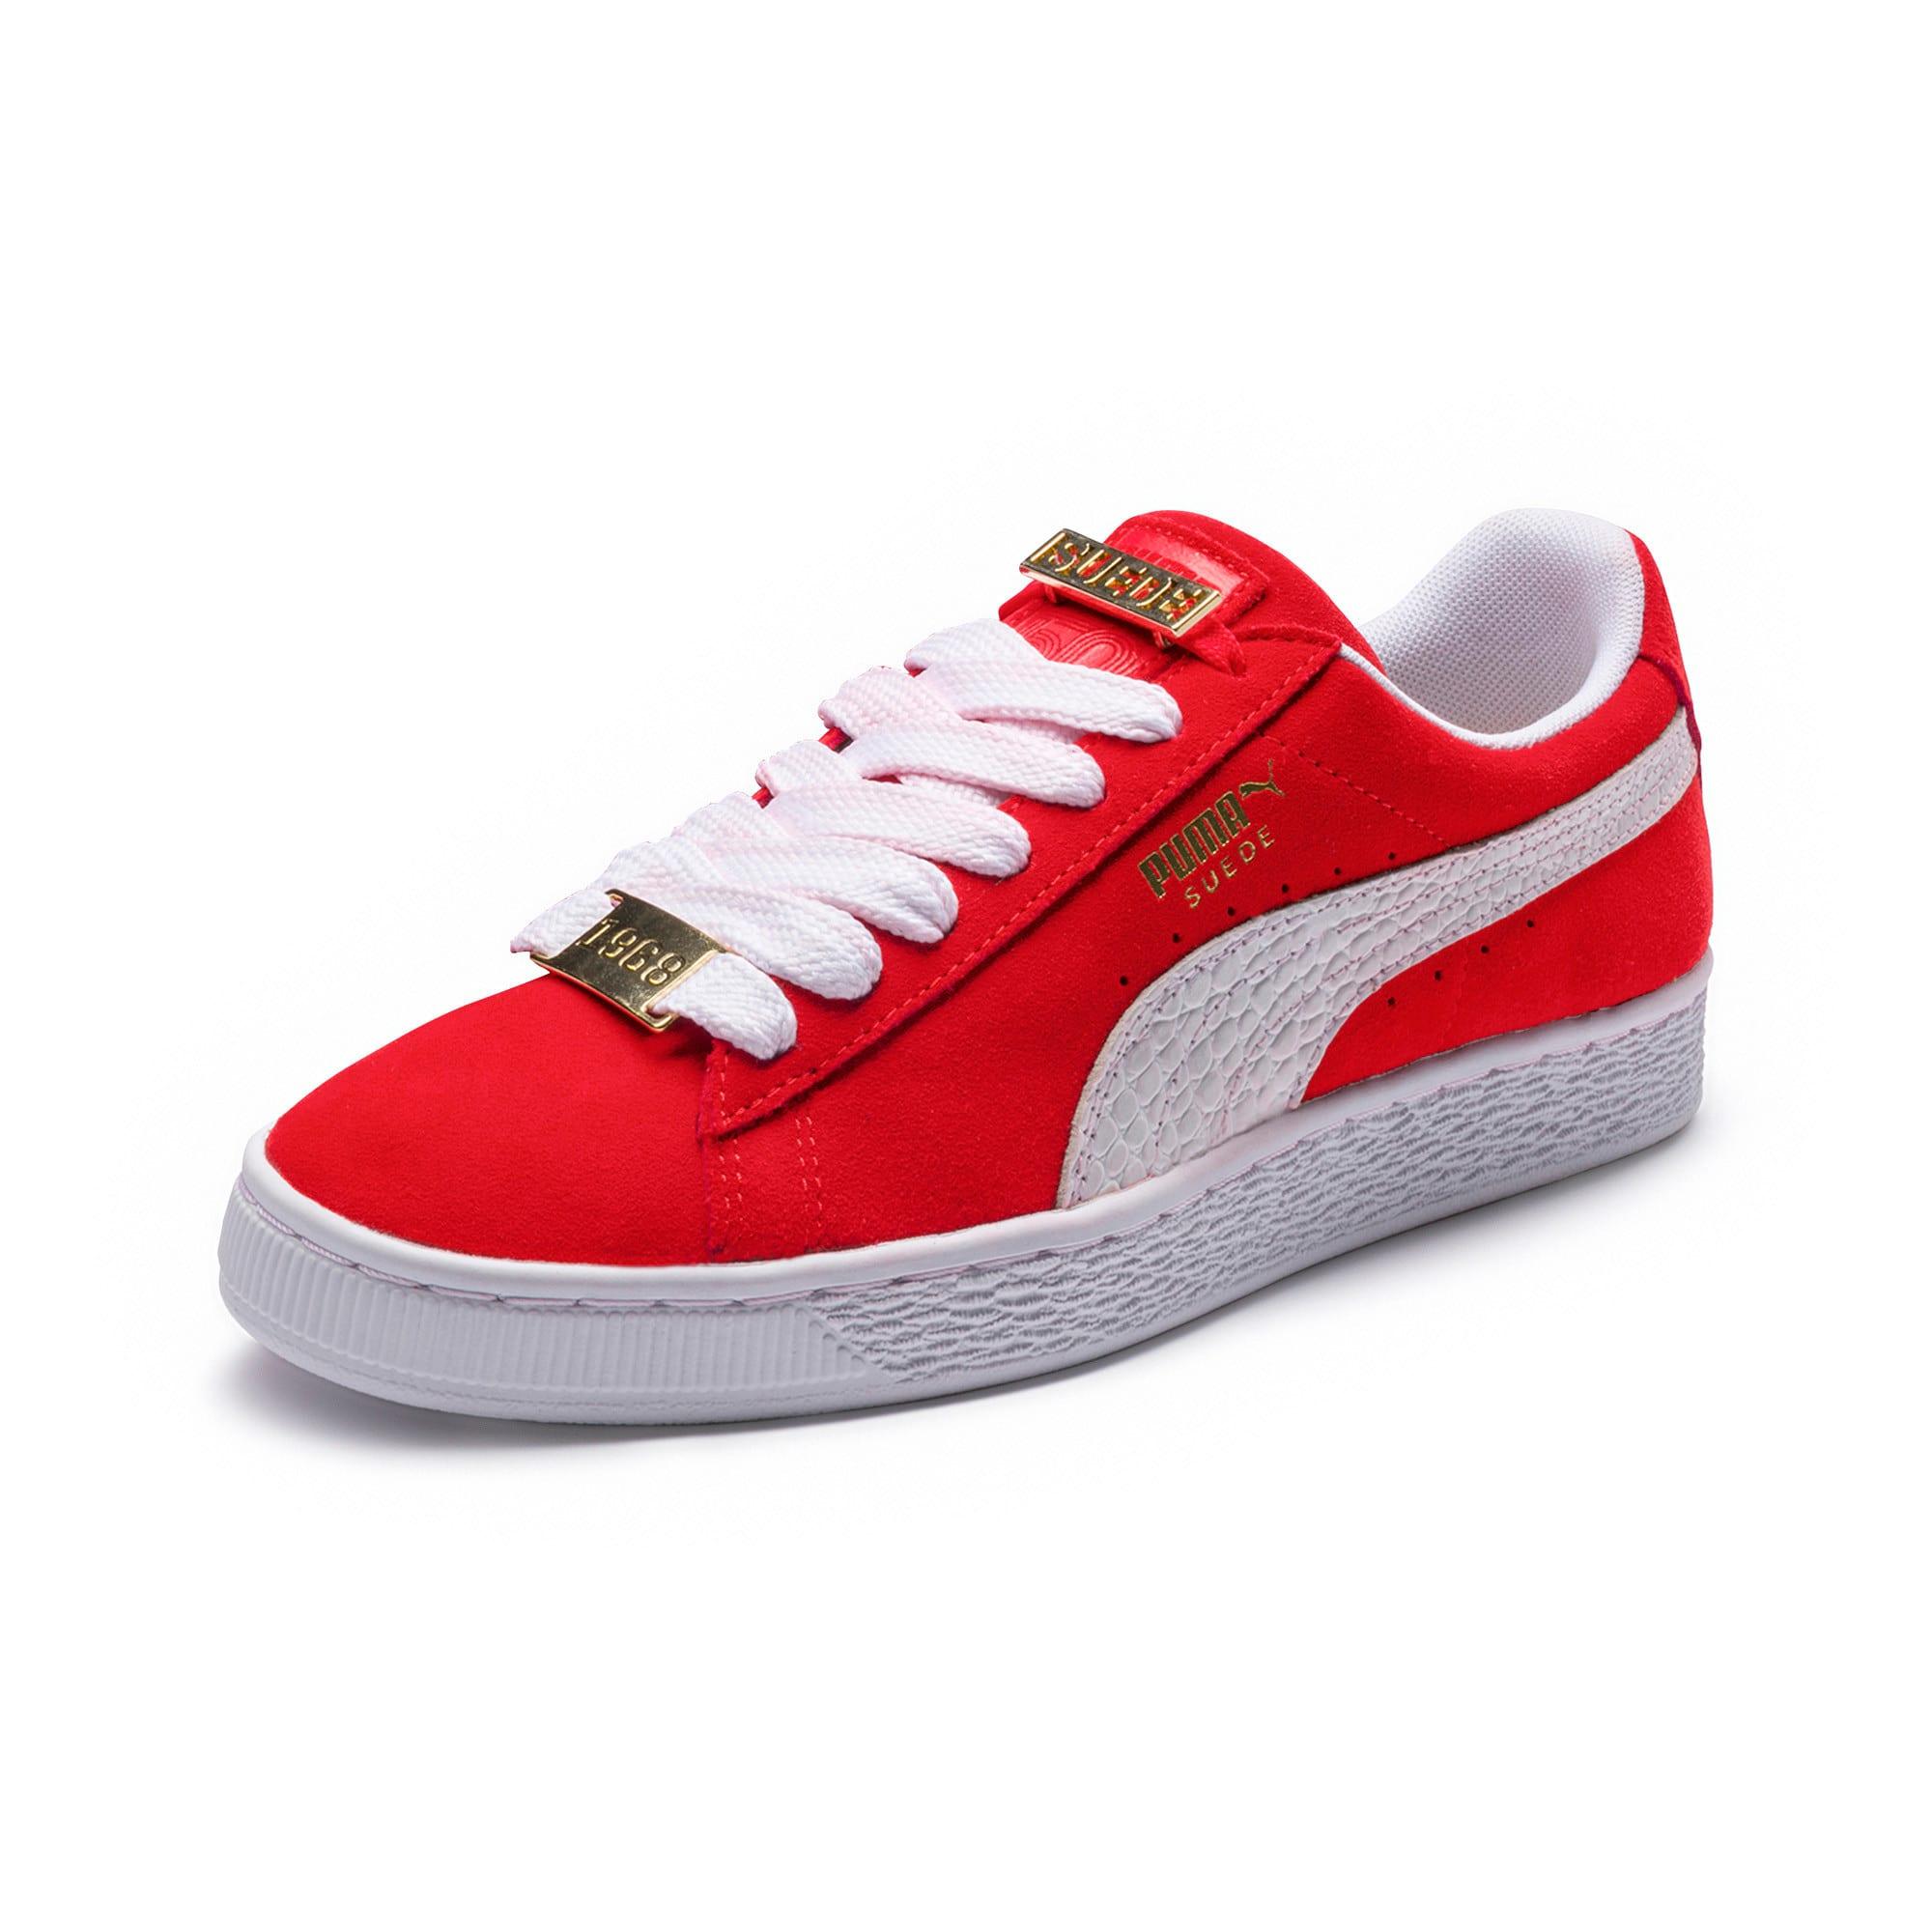 buy popular b8ef1 7d52b Suede Classic B-BOY Men's Sneakers